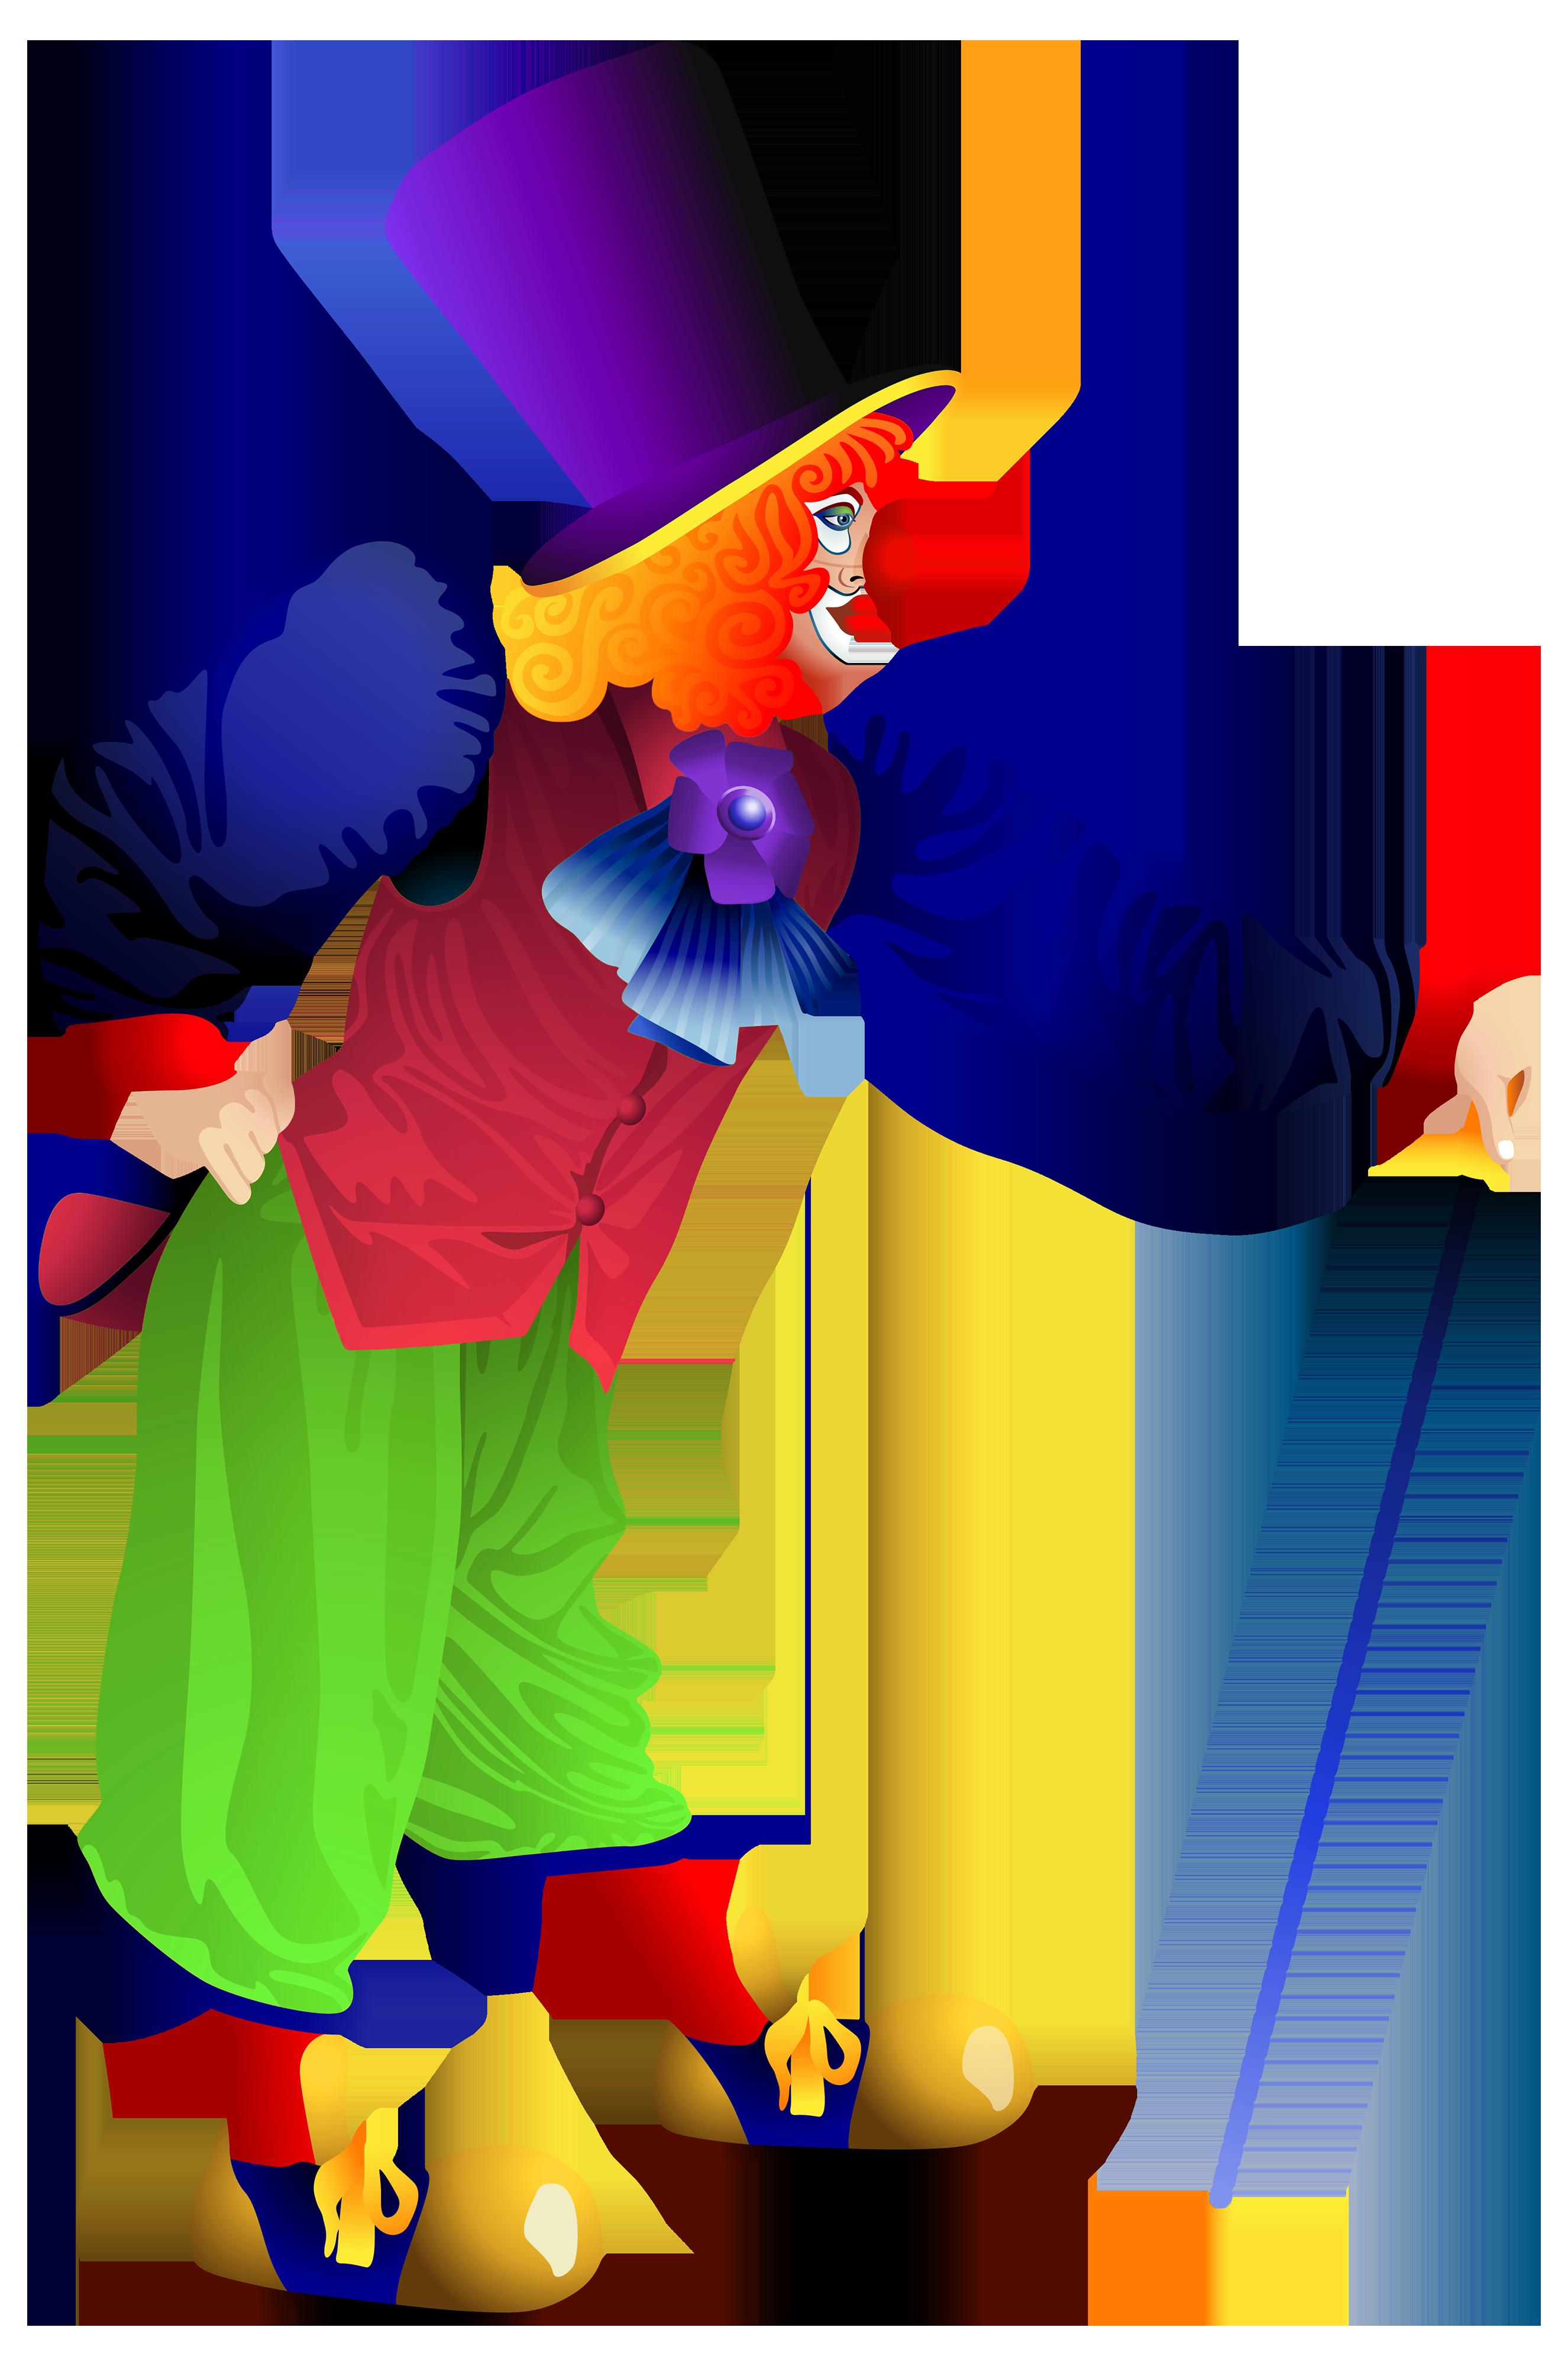 vector download Png clip art image. Transparent 2ds clown